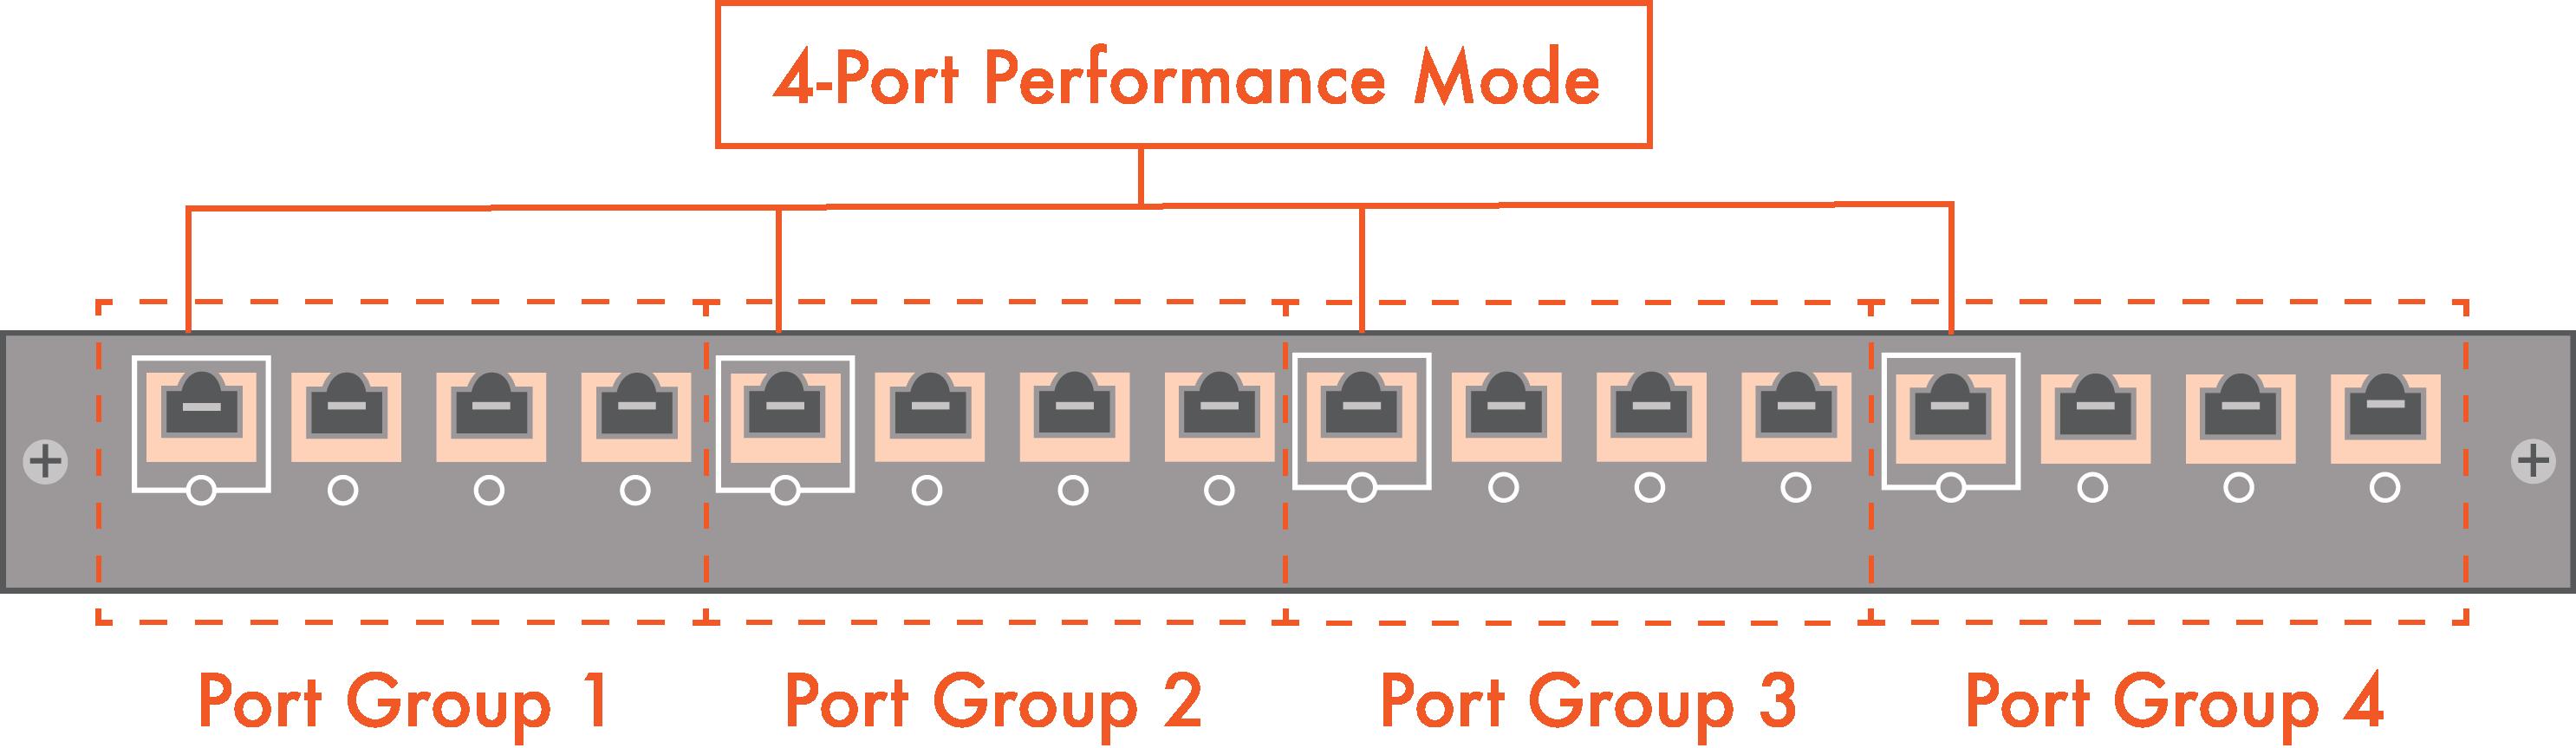 4-Ports-In-Performance-Mode-Copper-- pivit - global - blog